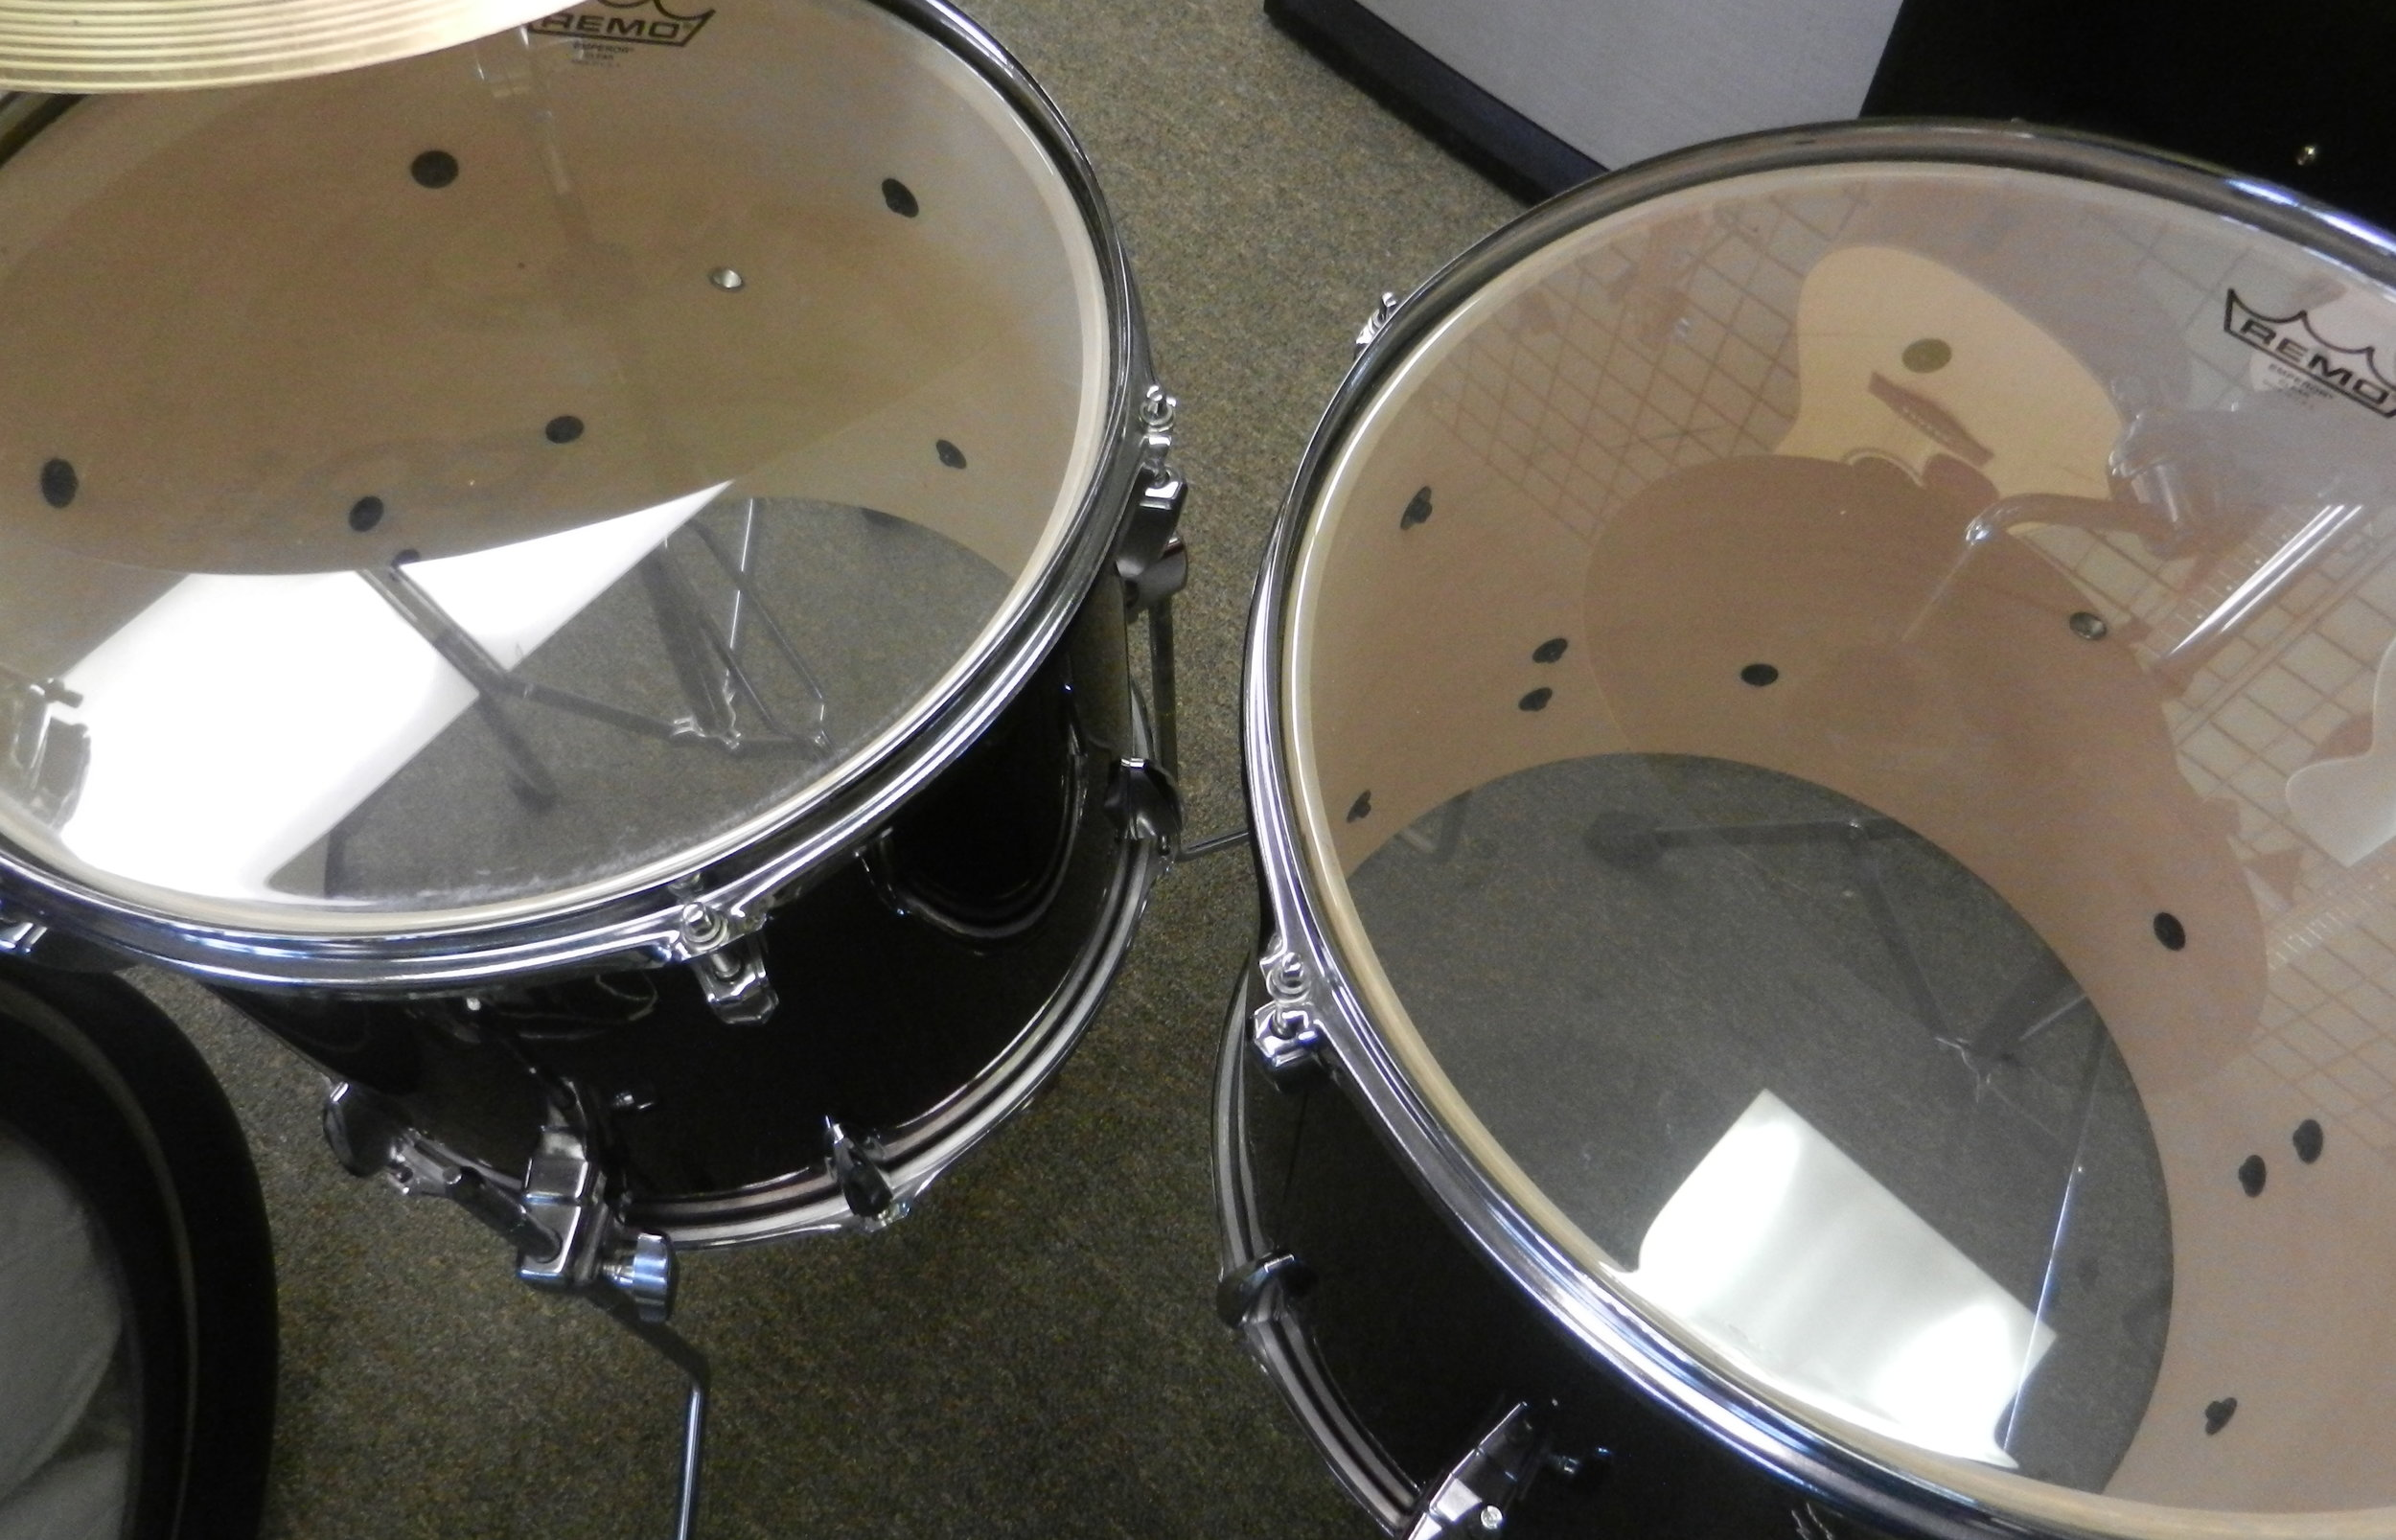 Used Tama Imperialstar Drum Set Floor Toms.JPG